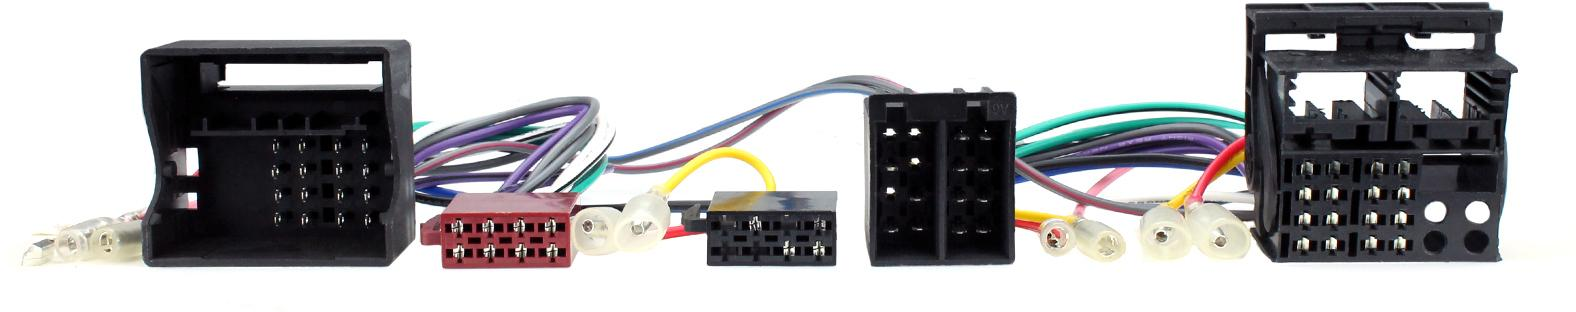 citroen iso t harness adaptor ct1 wiring pigtails for automotive citroen iso t harness adaptor ct10ct01